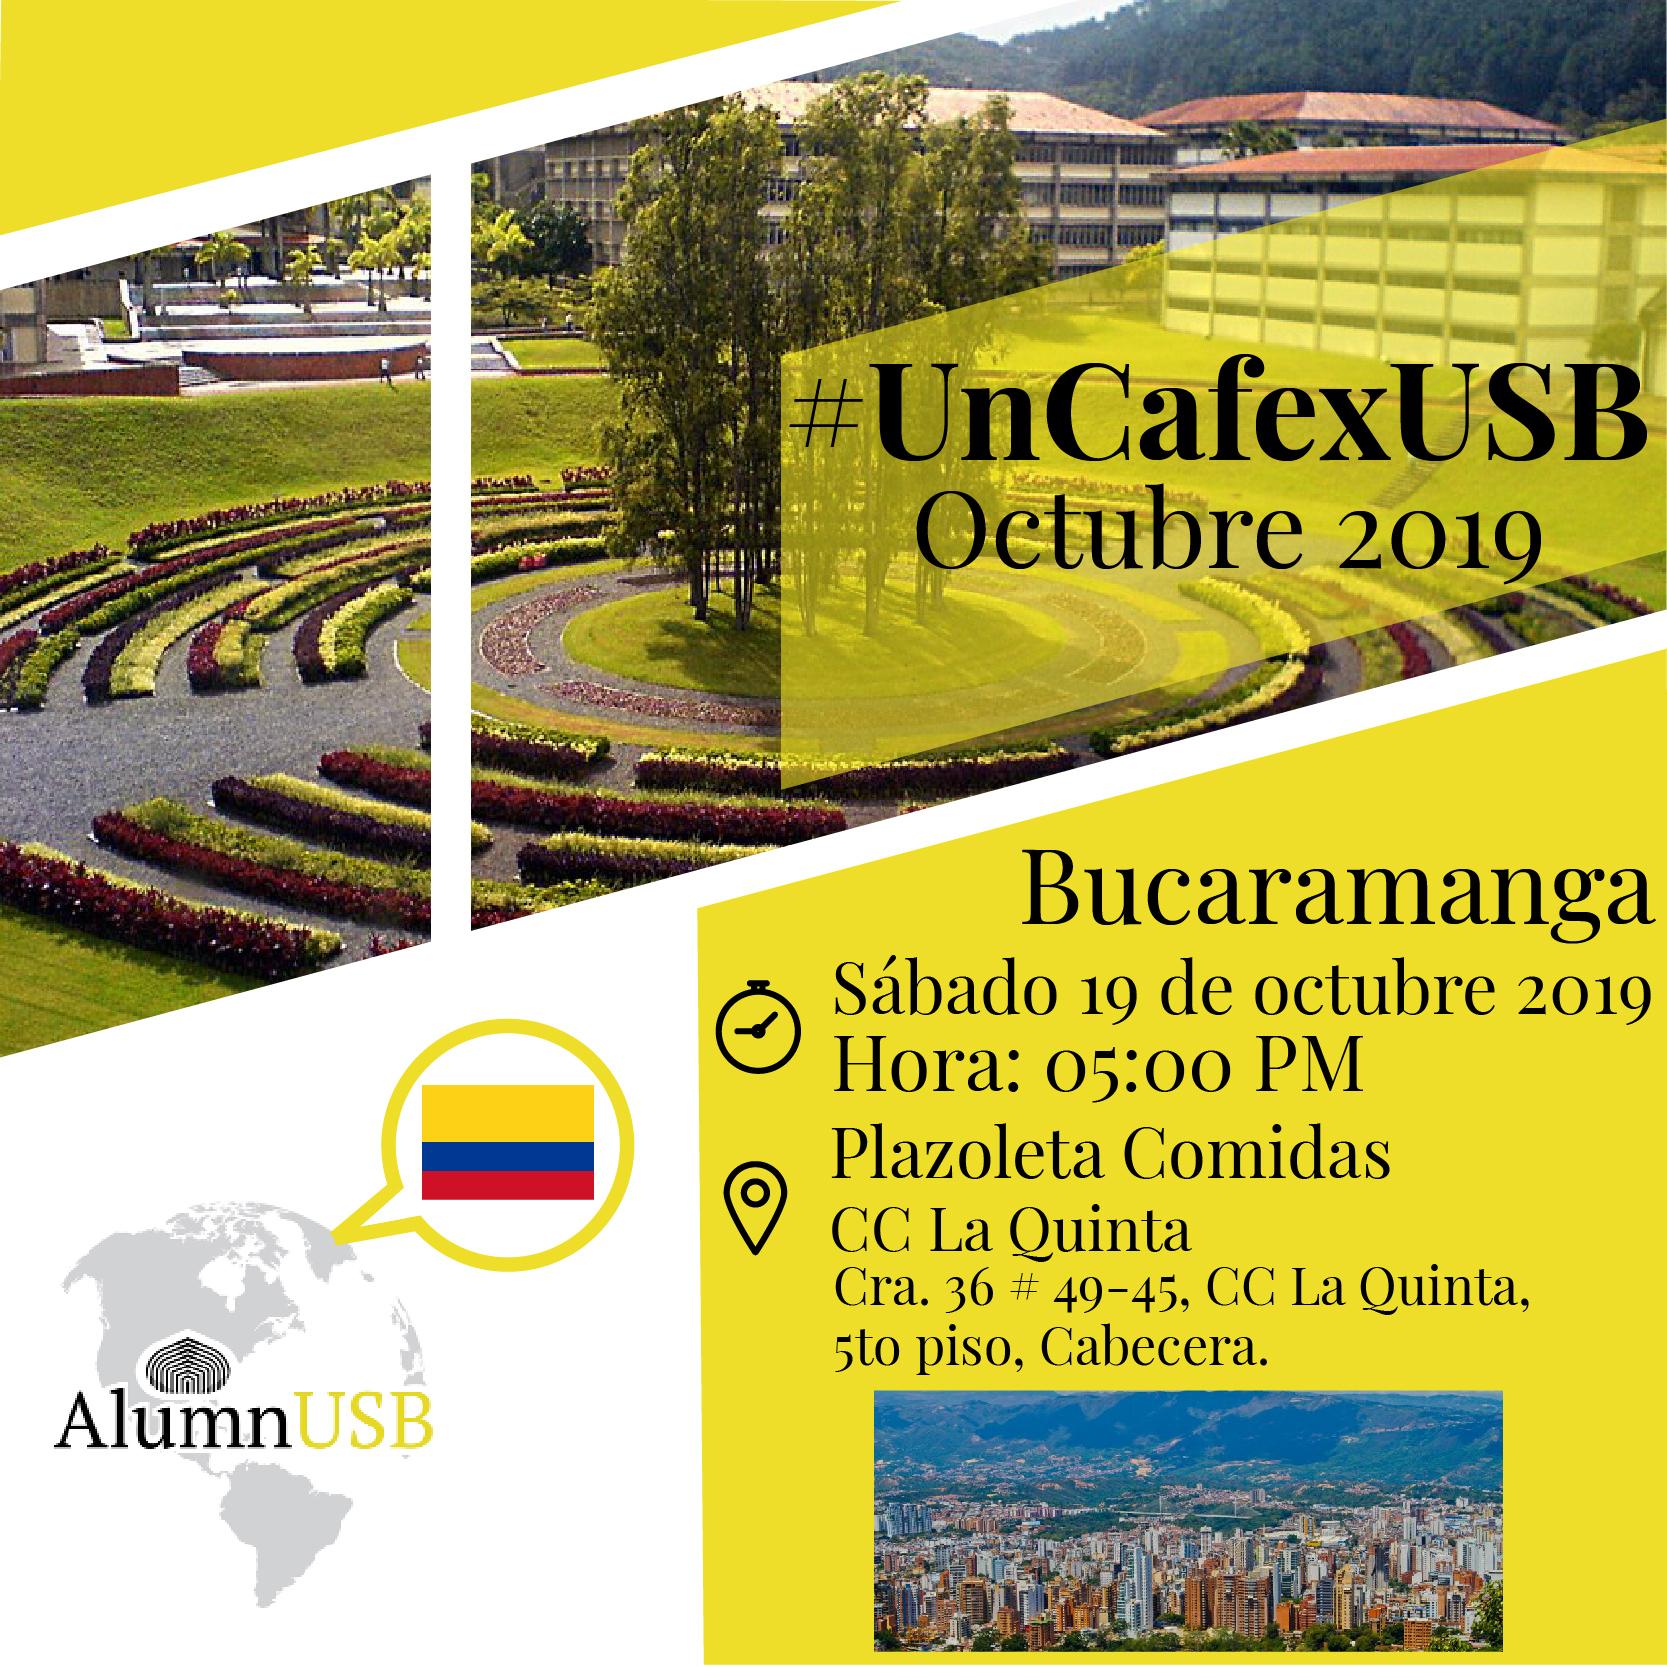 Bucaramanga Octubre 2019_Mesa de trabajo 1